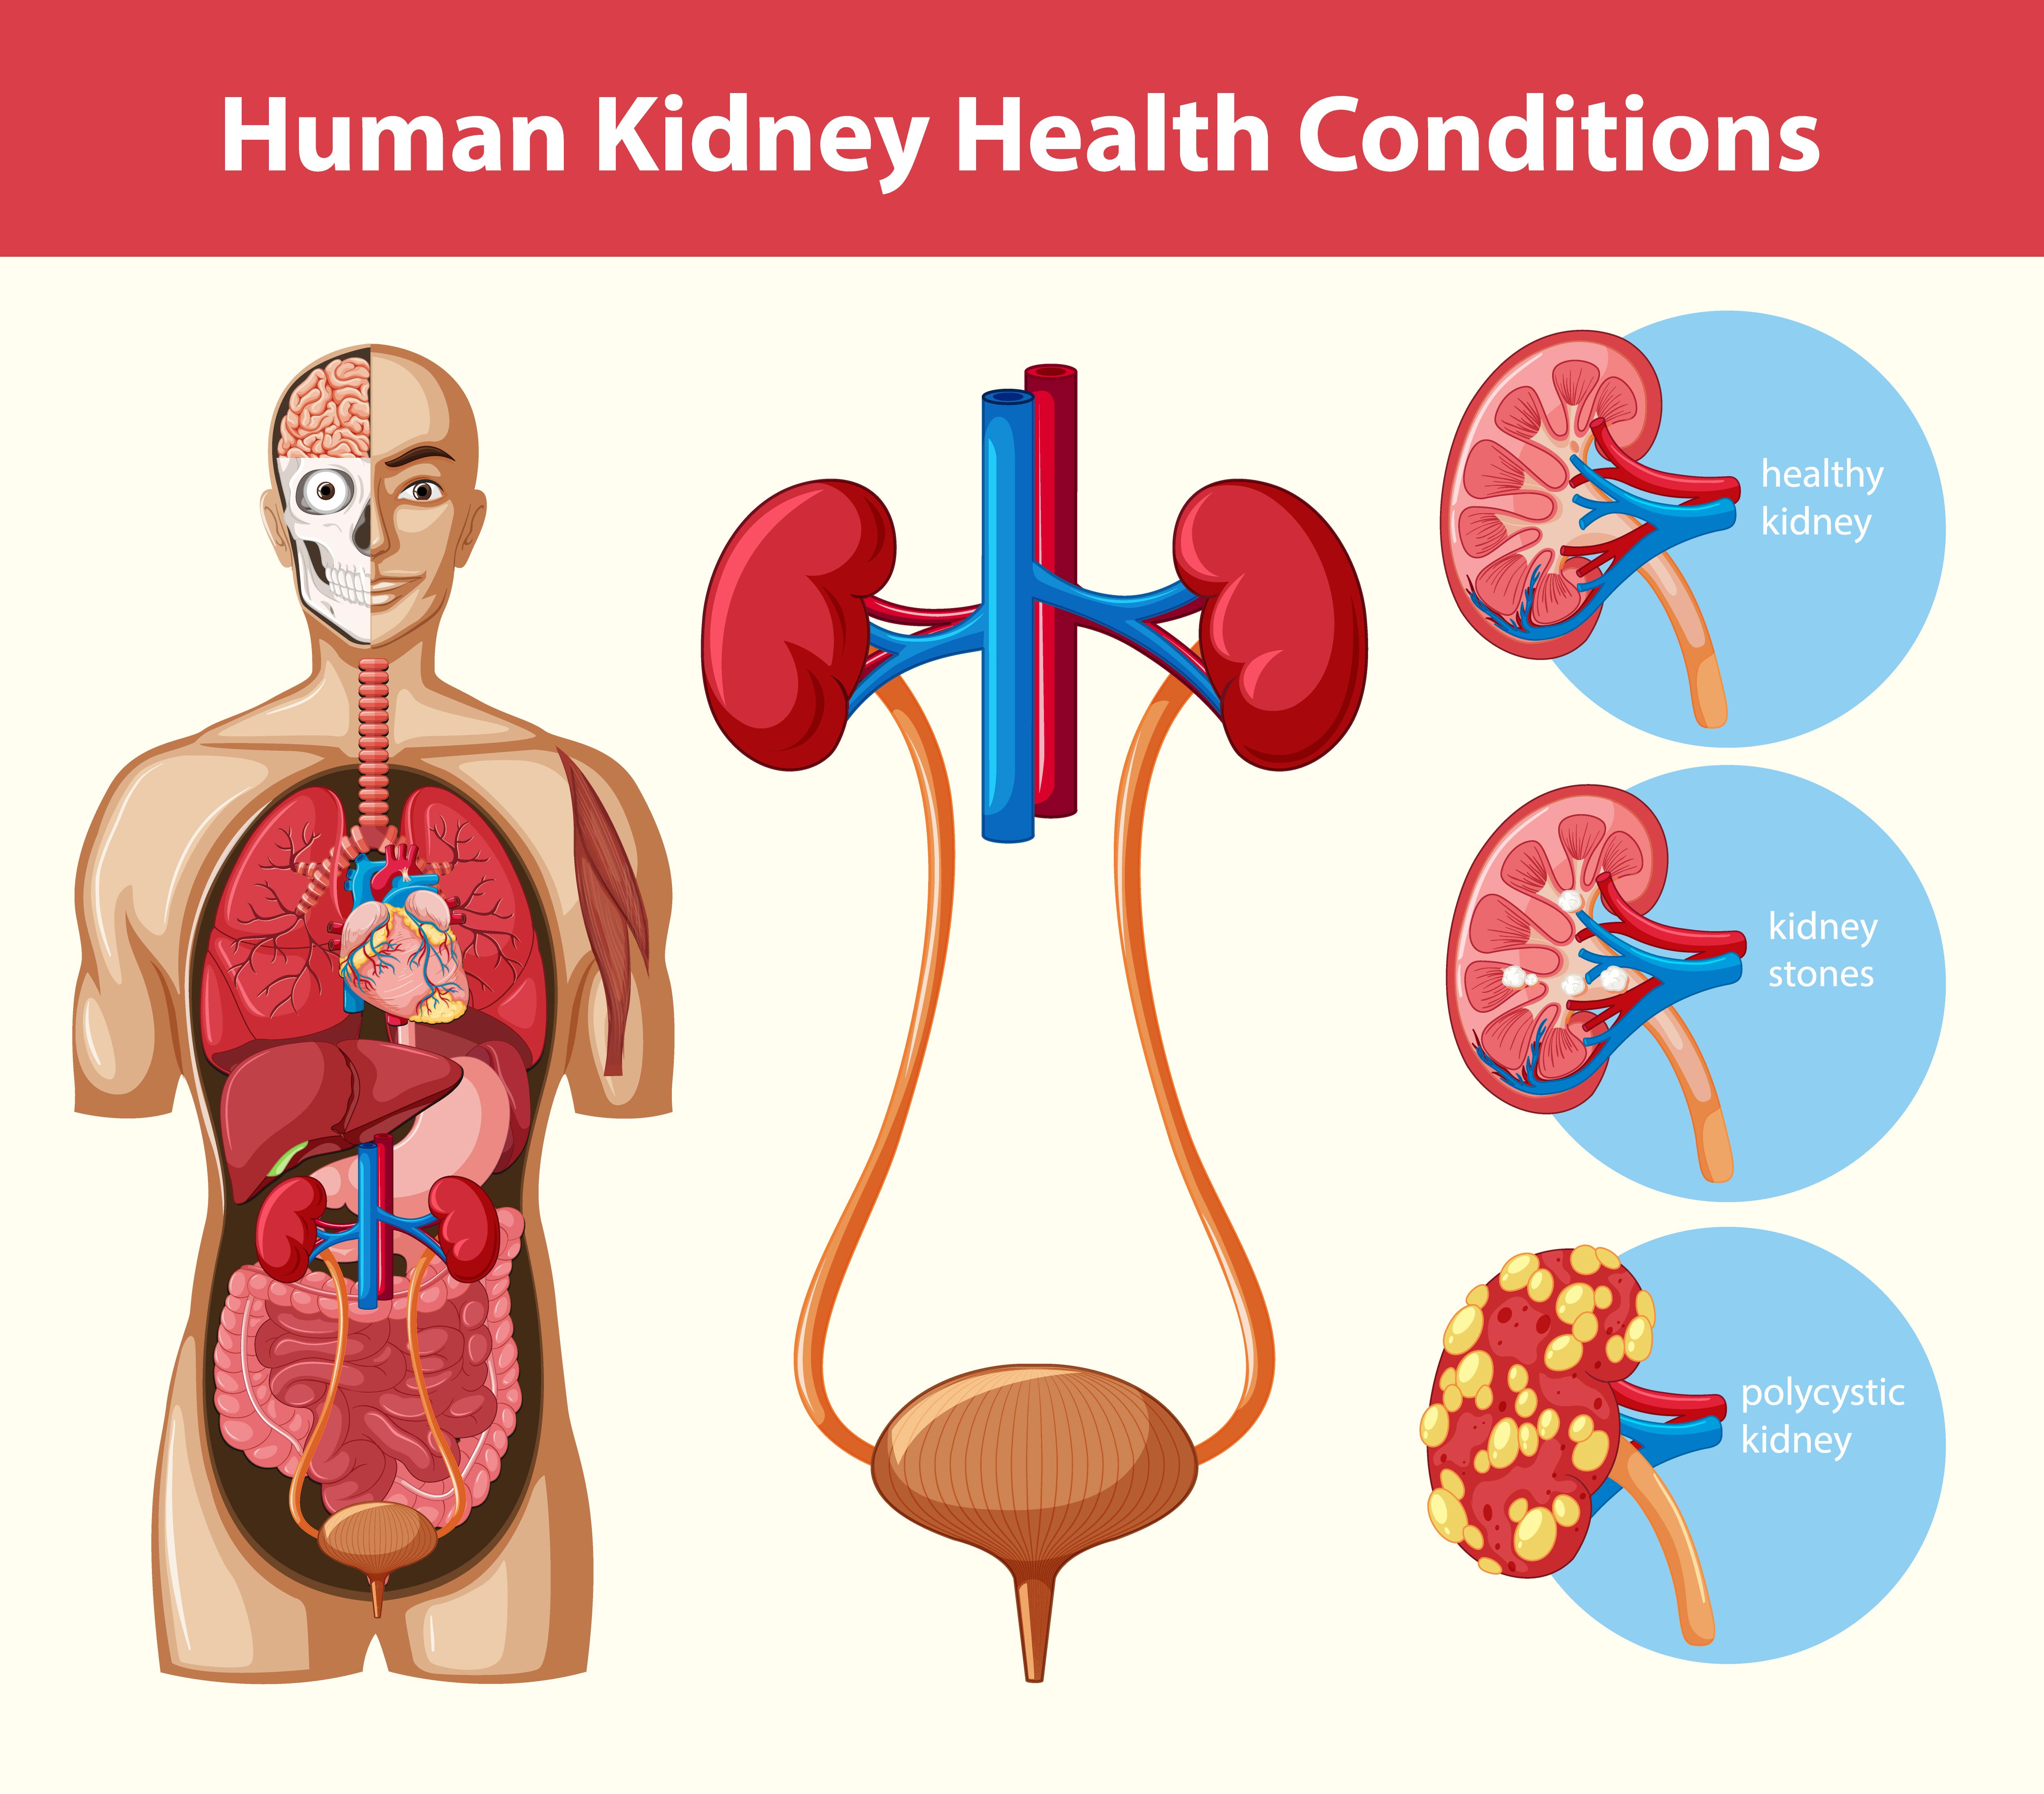 Human Kidney Health Conditions Infographic Download Free Vectors Clipart Graphics Vector Art